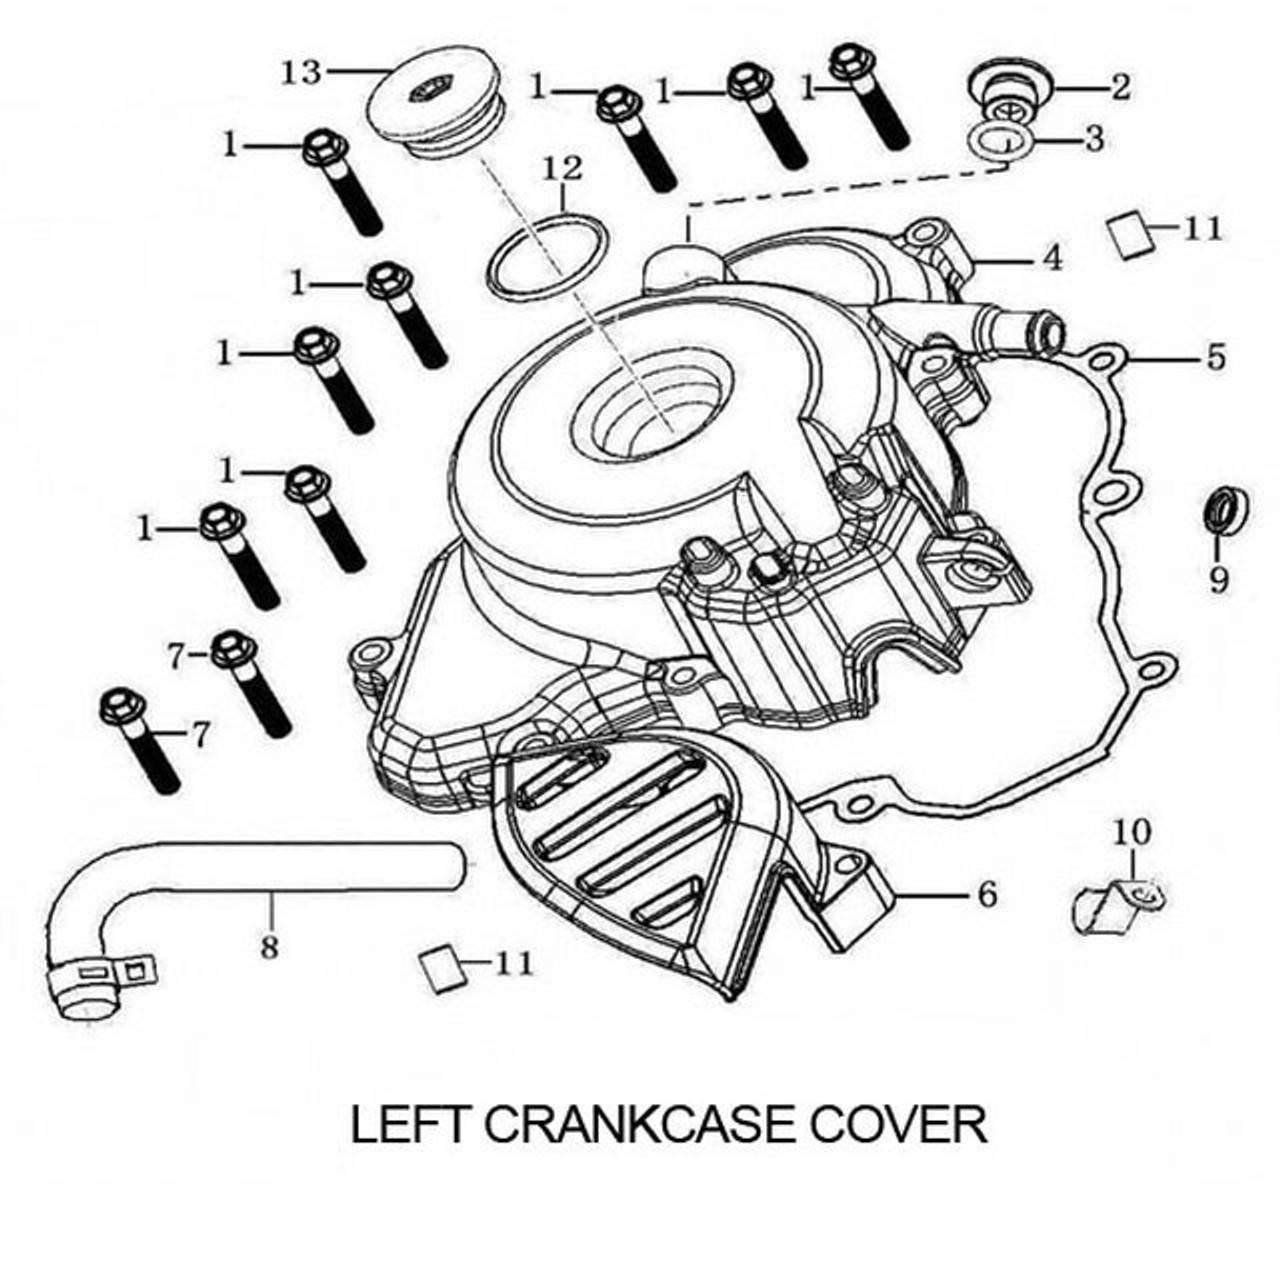 ENGINE CRANKCASE COVER, LEFT